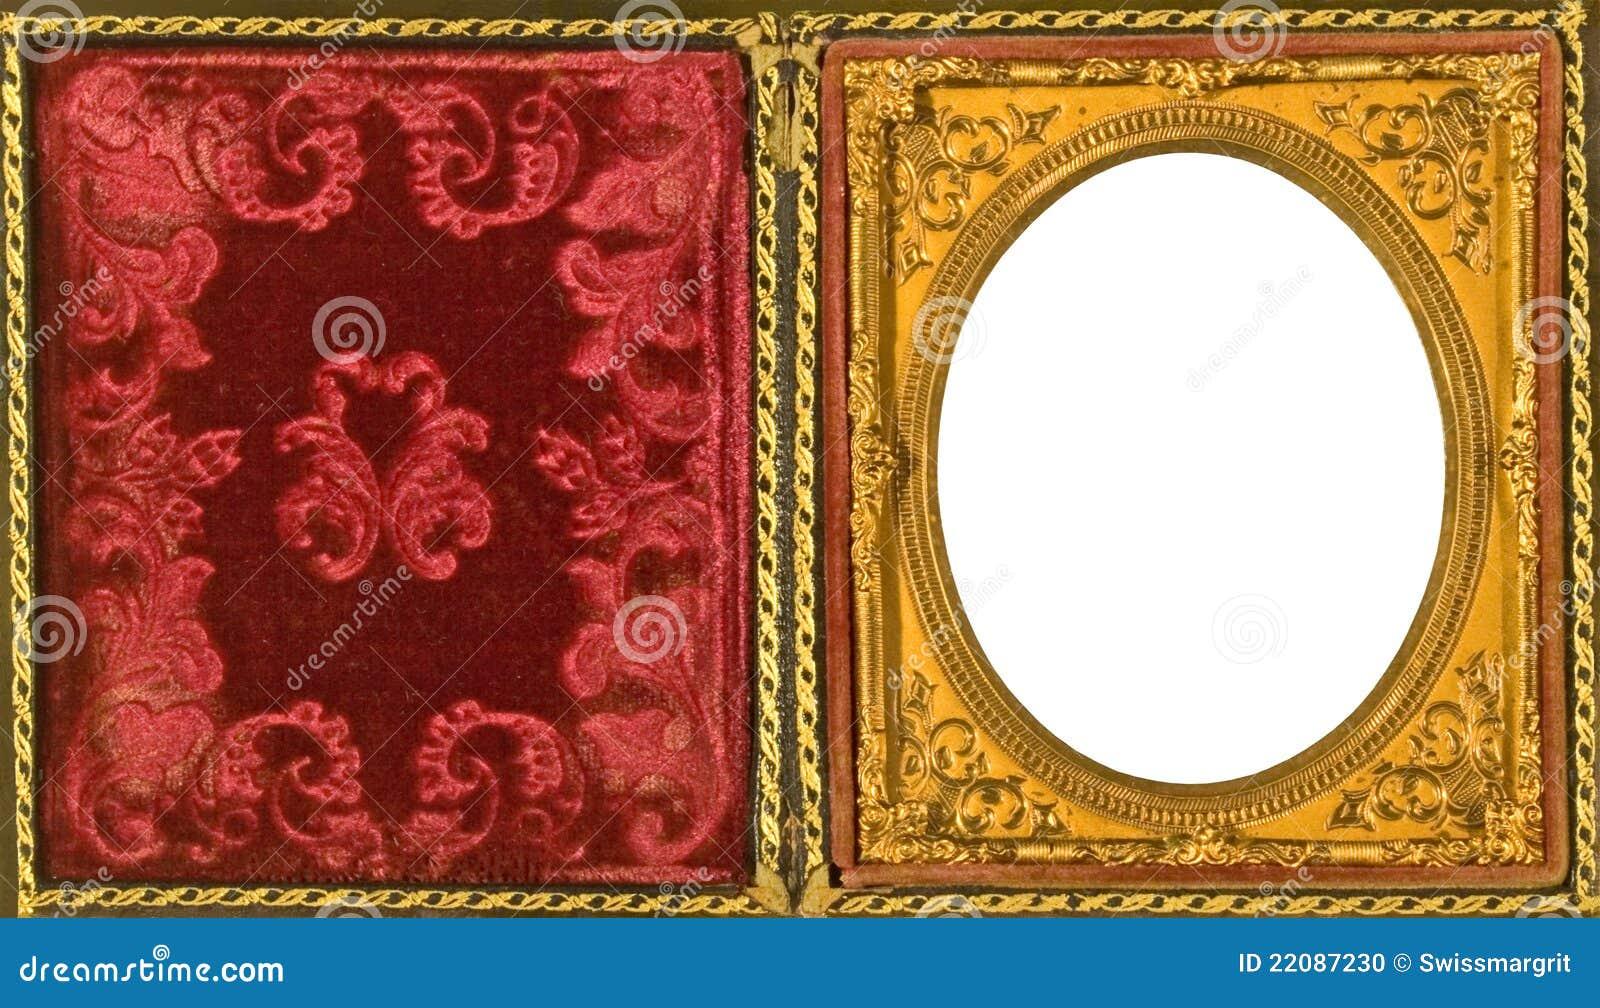 Beautiful Ornate Daguerreotype Picture Frame Stock Photo